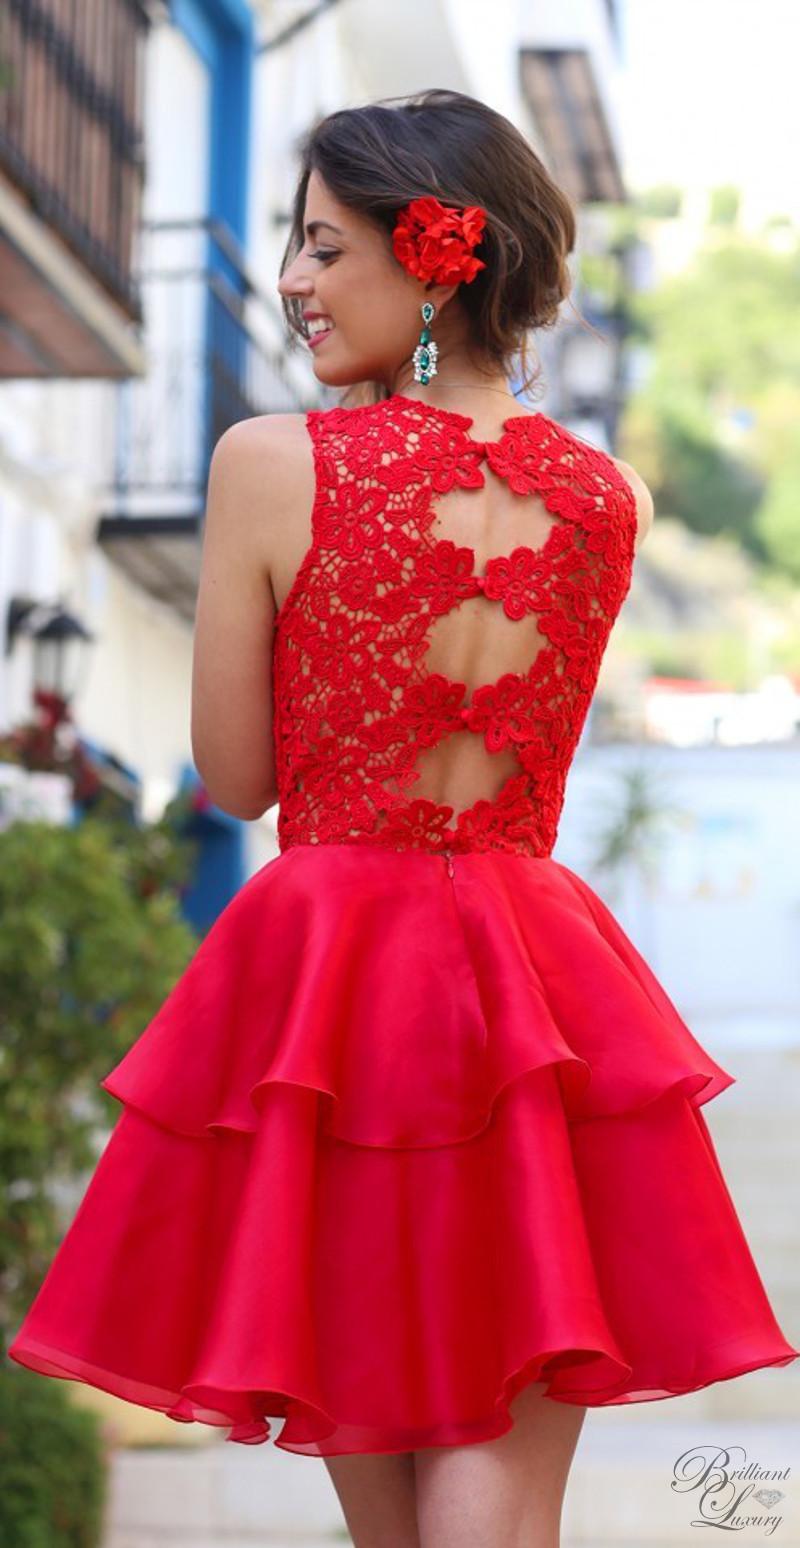 Brilliant Luxury ♦ Silvia Navarro red Magnolia embroidered dress